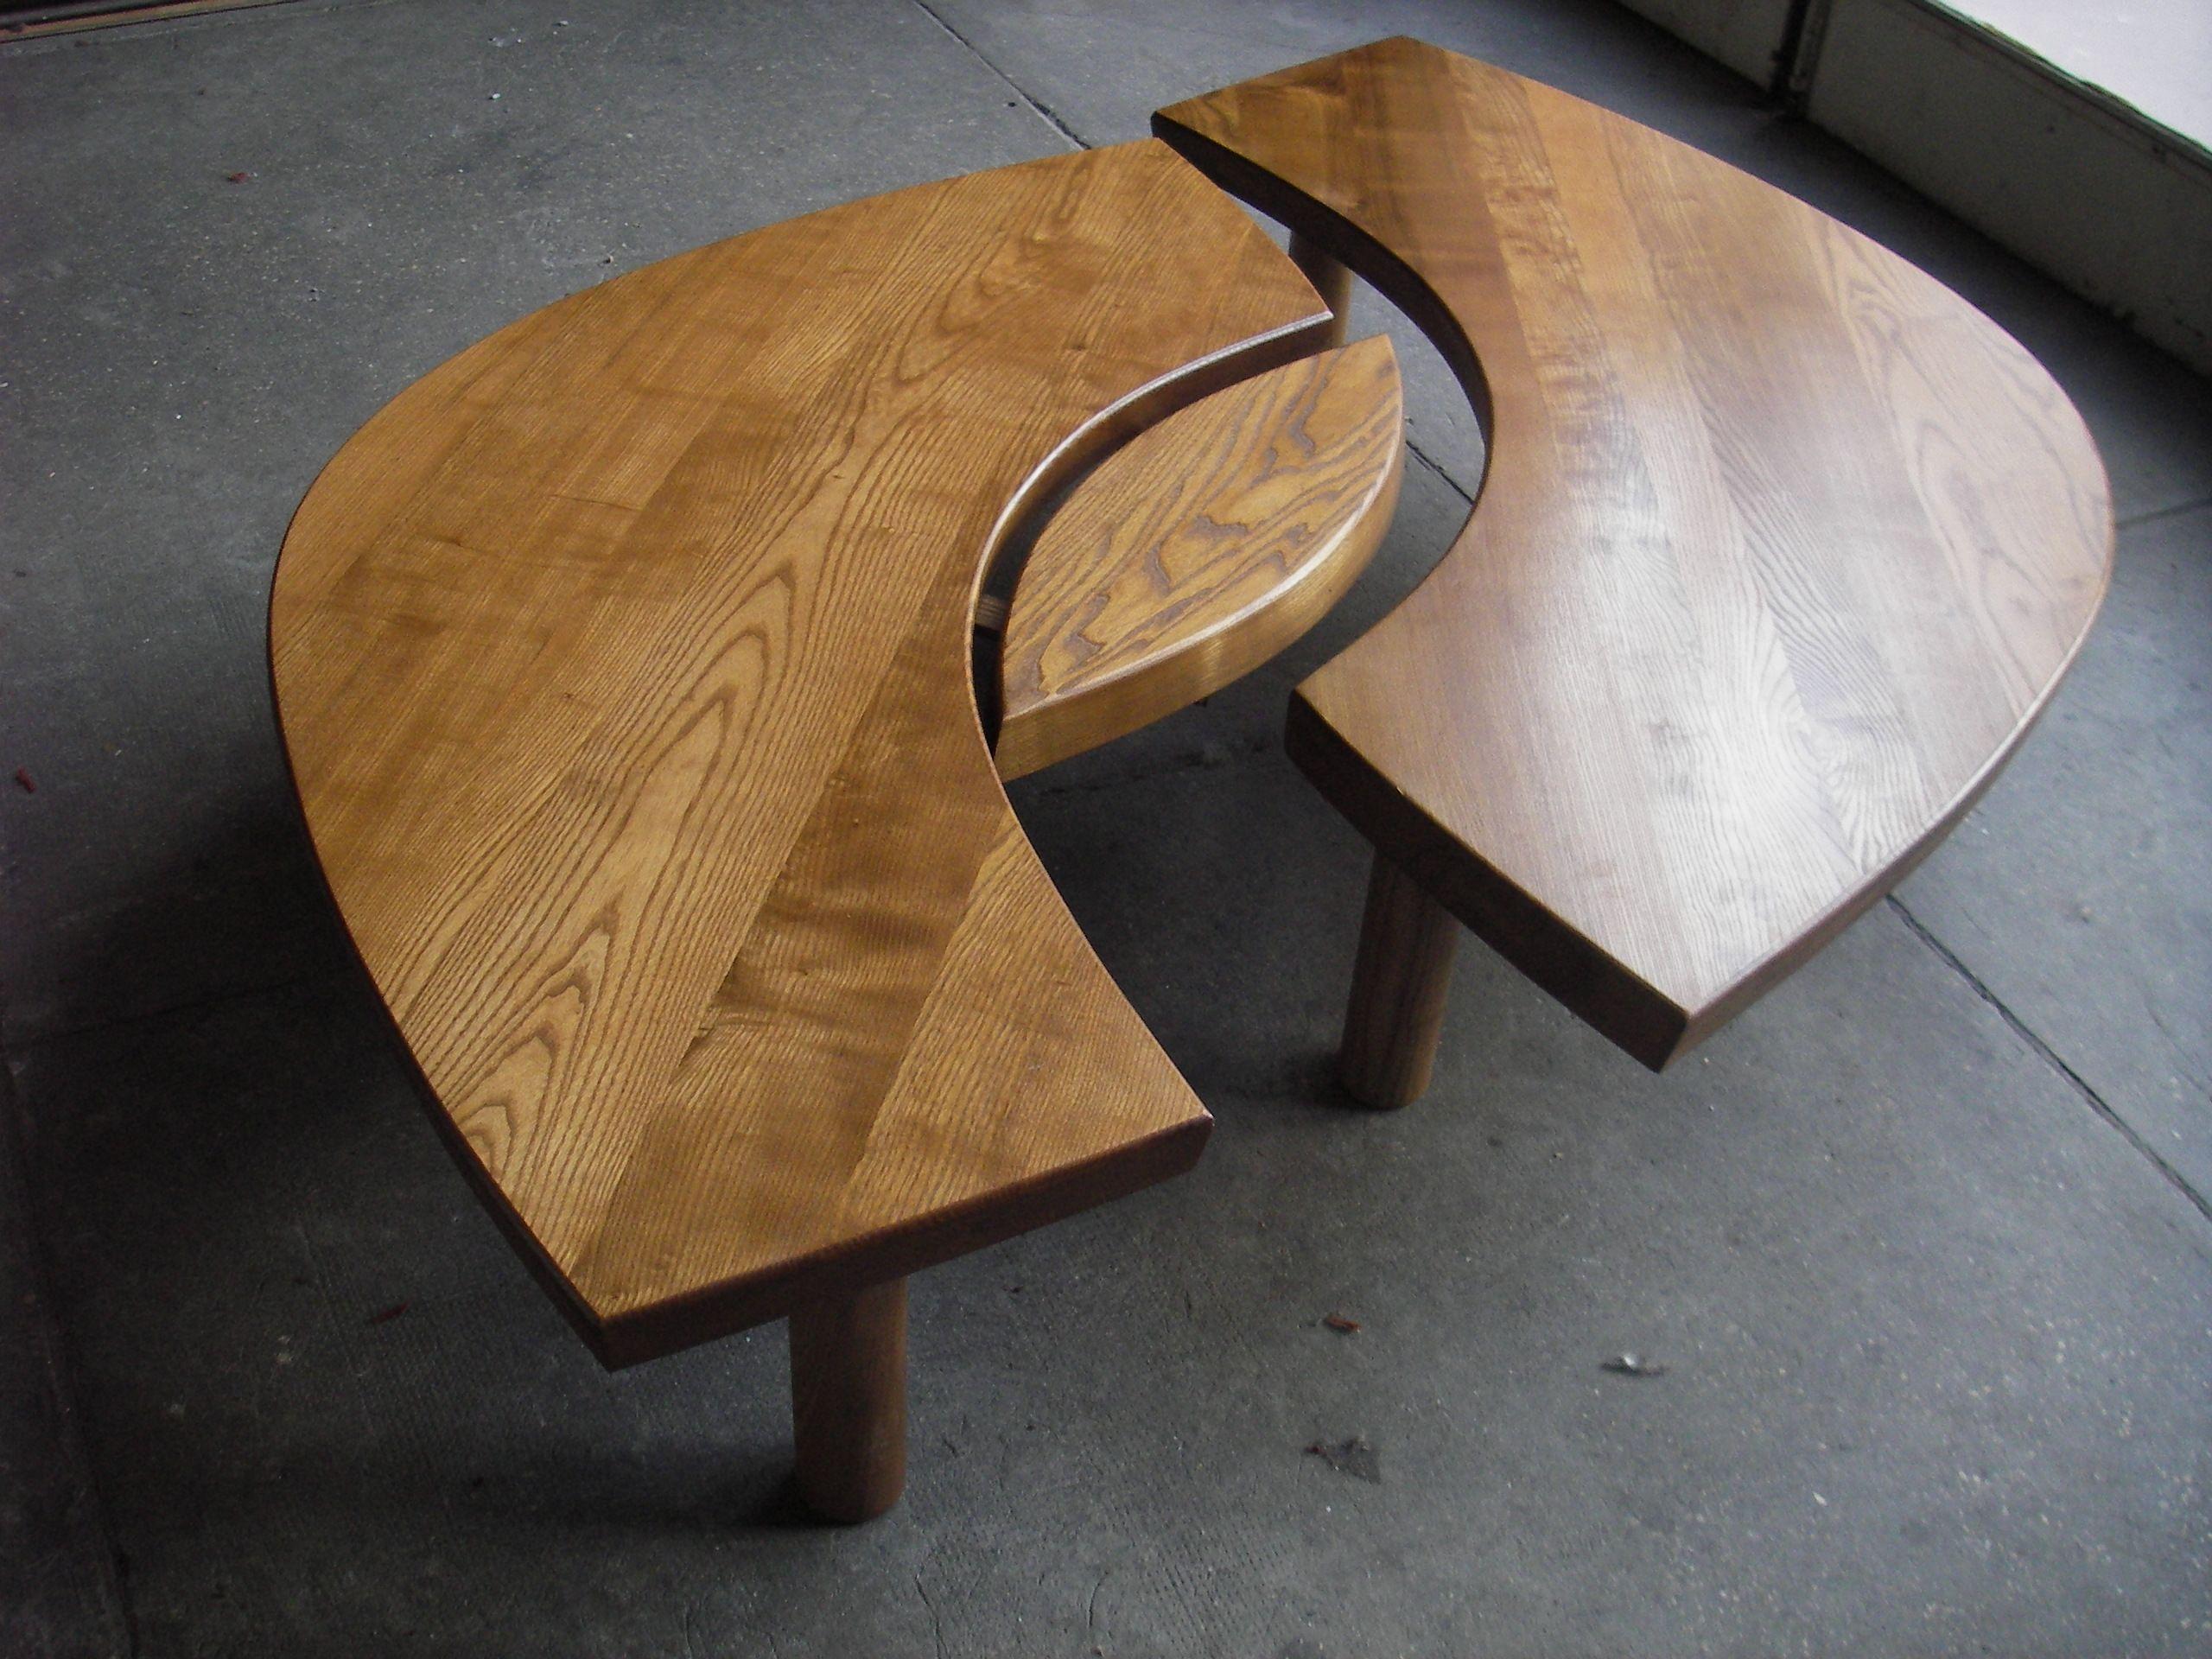 7d0209be948b12c0c1681588b1fc8d2b Incroyable De Table Basse Le Corbusier Concept